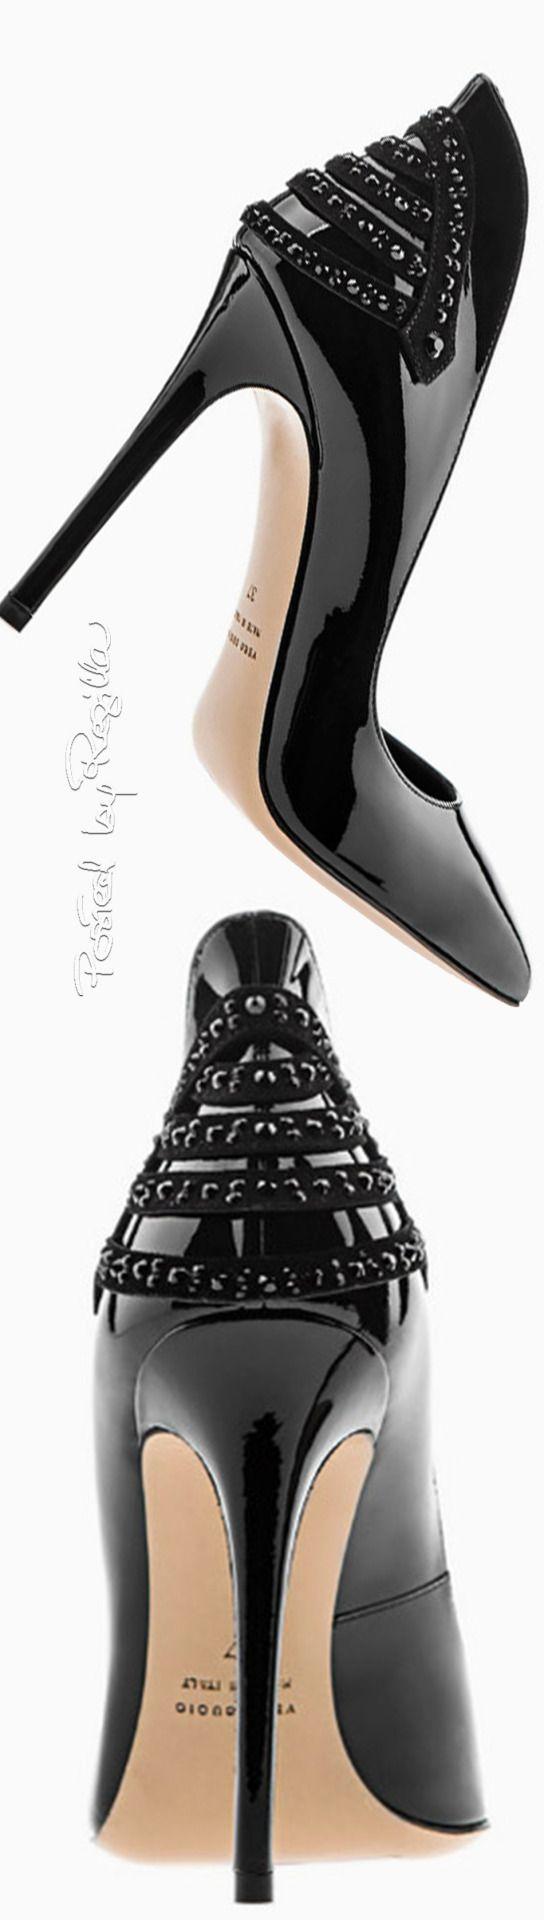 stunning shoes heels boots 2016 pumps winter